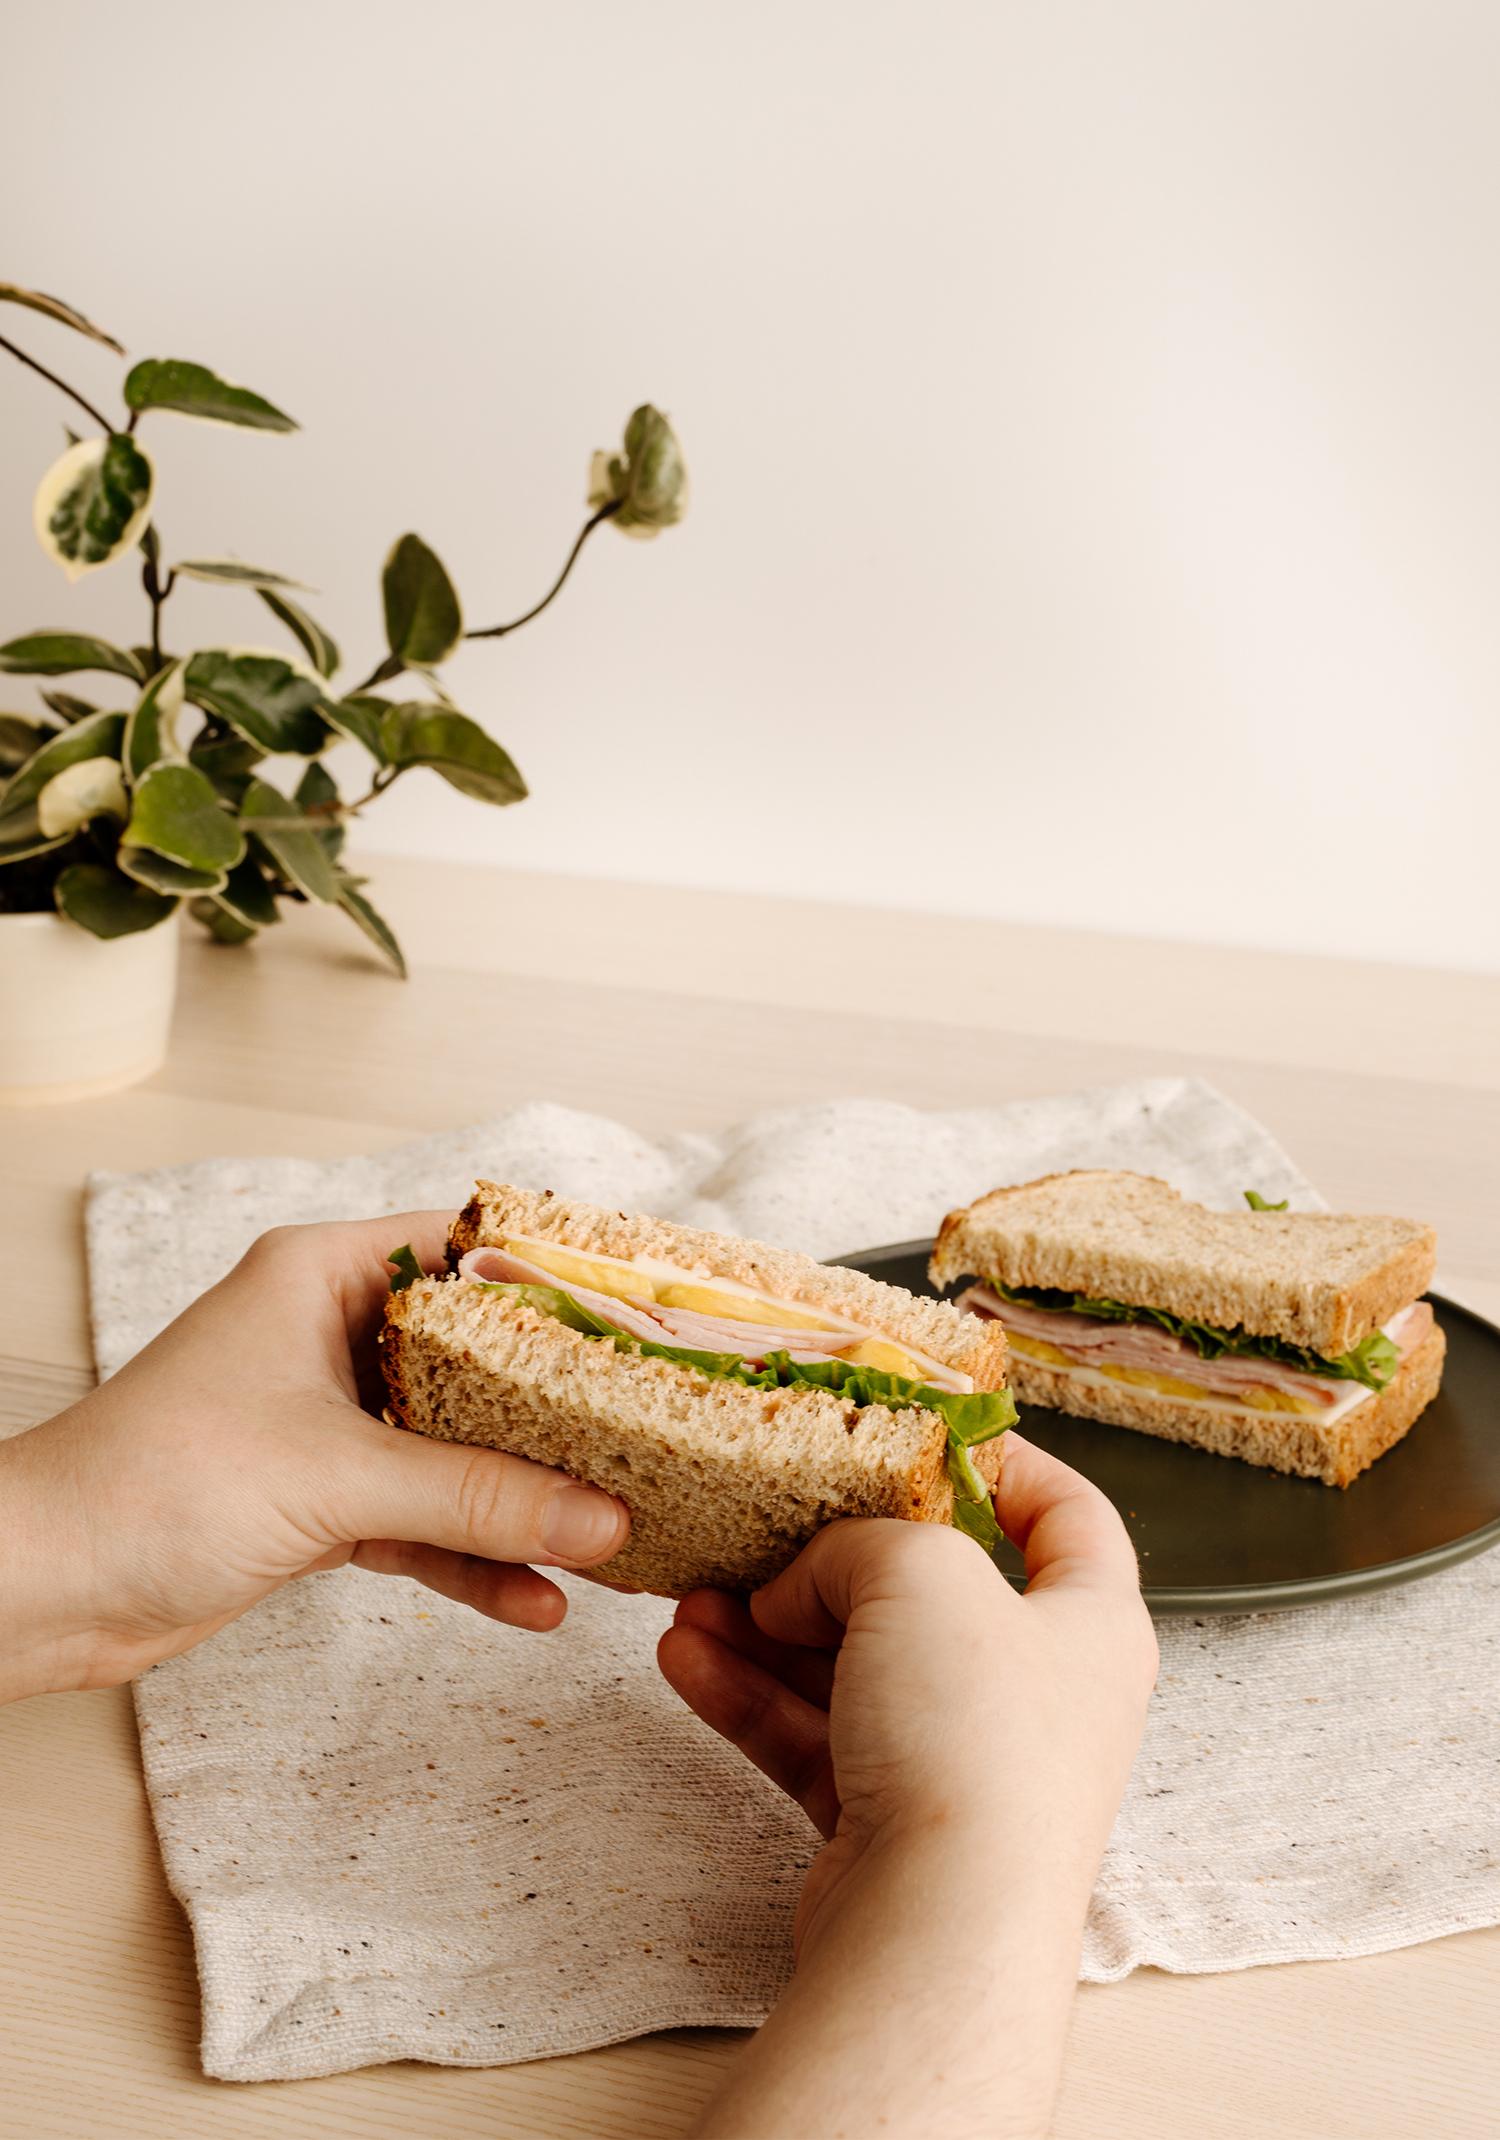 Sandwich d'inspiration hawaïenne au jambon & à l'ananas